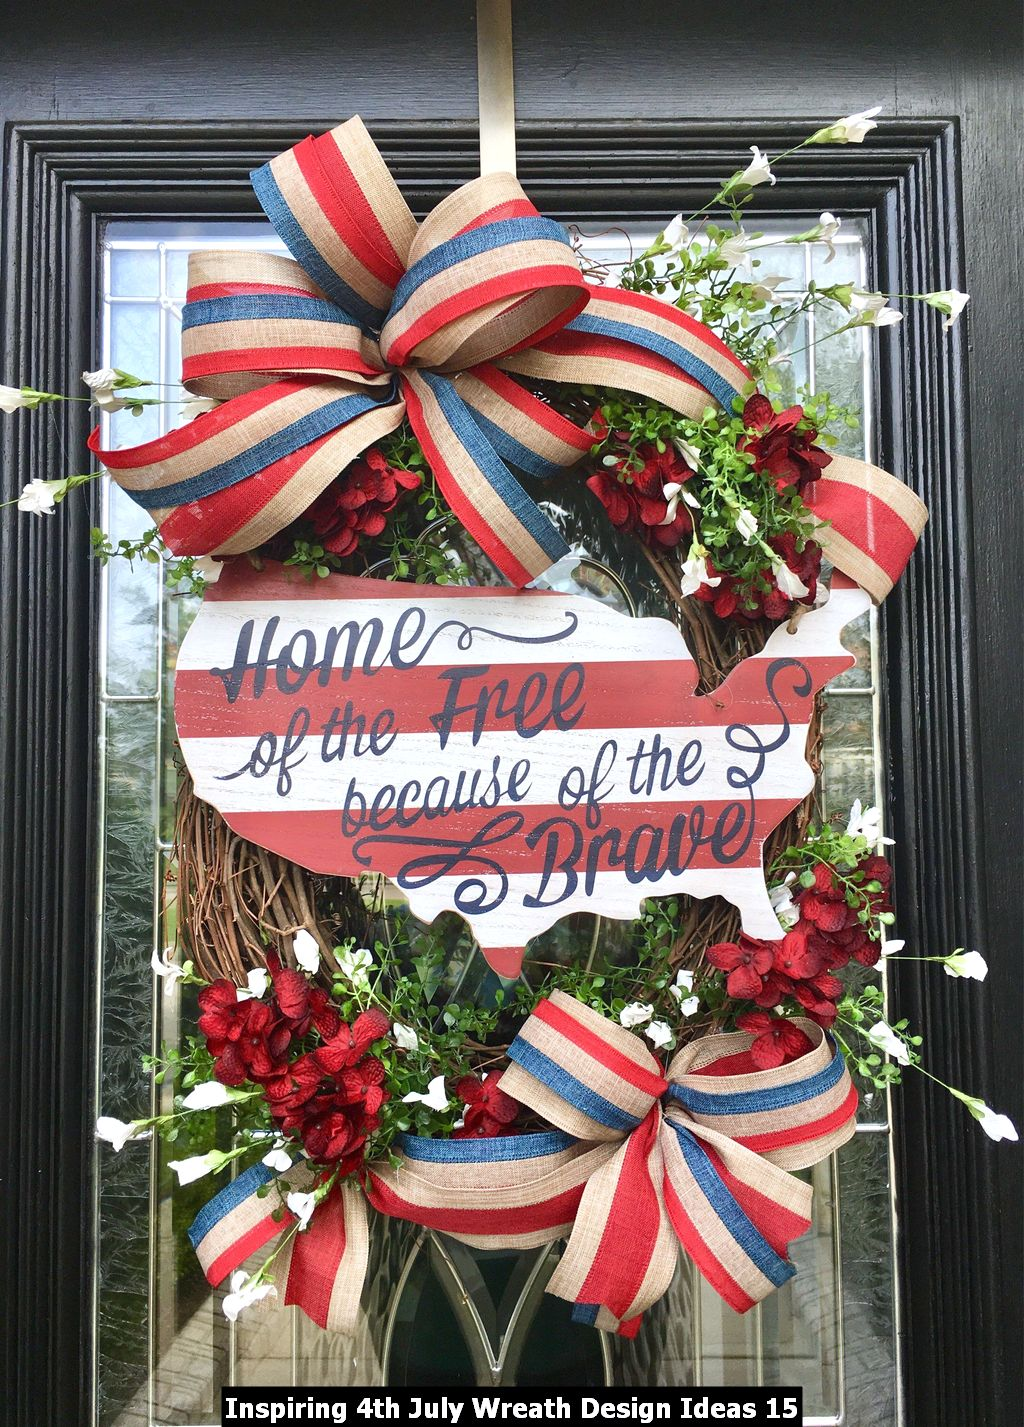 Inspiring 4th July Wreath Design Ideas 15